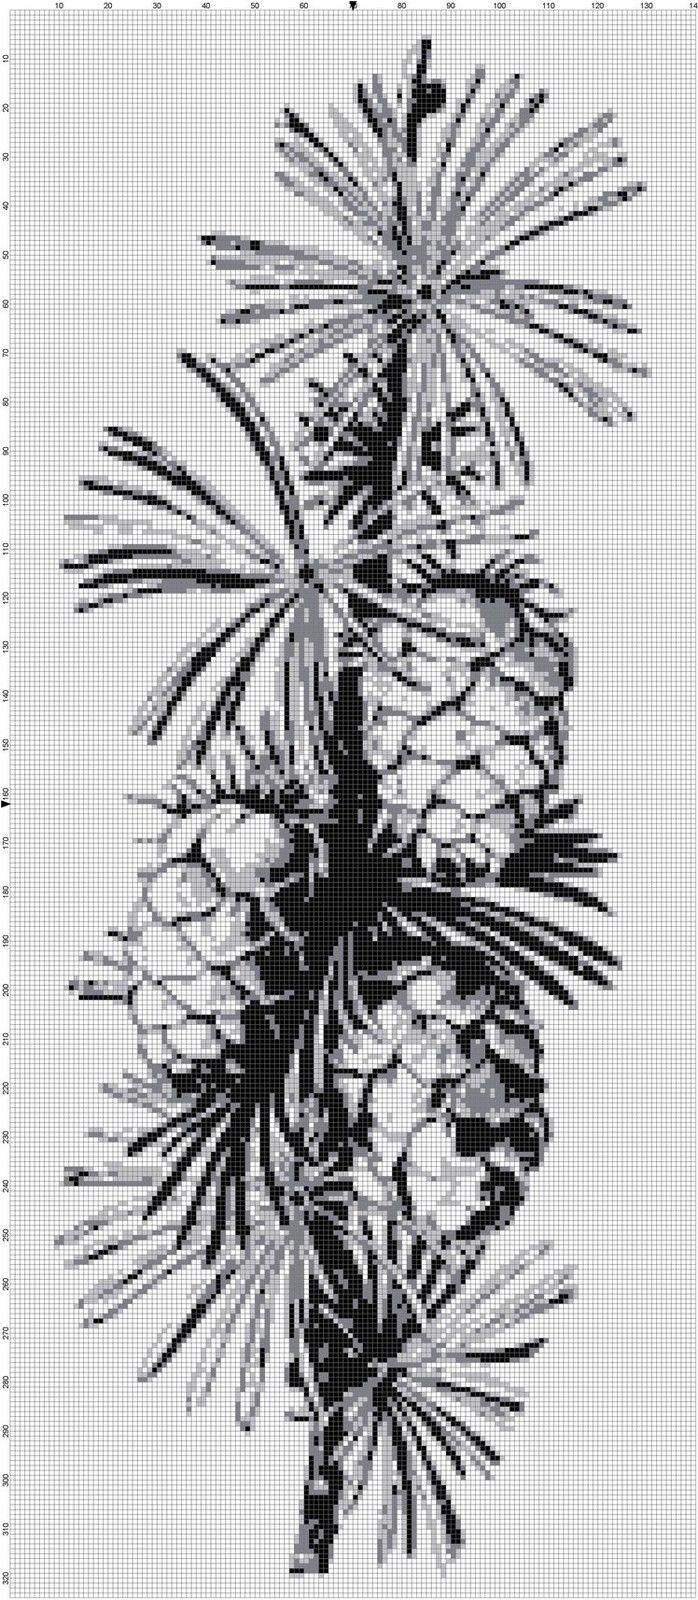 Handmade Pine Tree Grey Silhouette Cross-Stitch Pattern